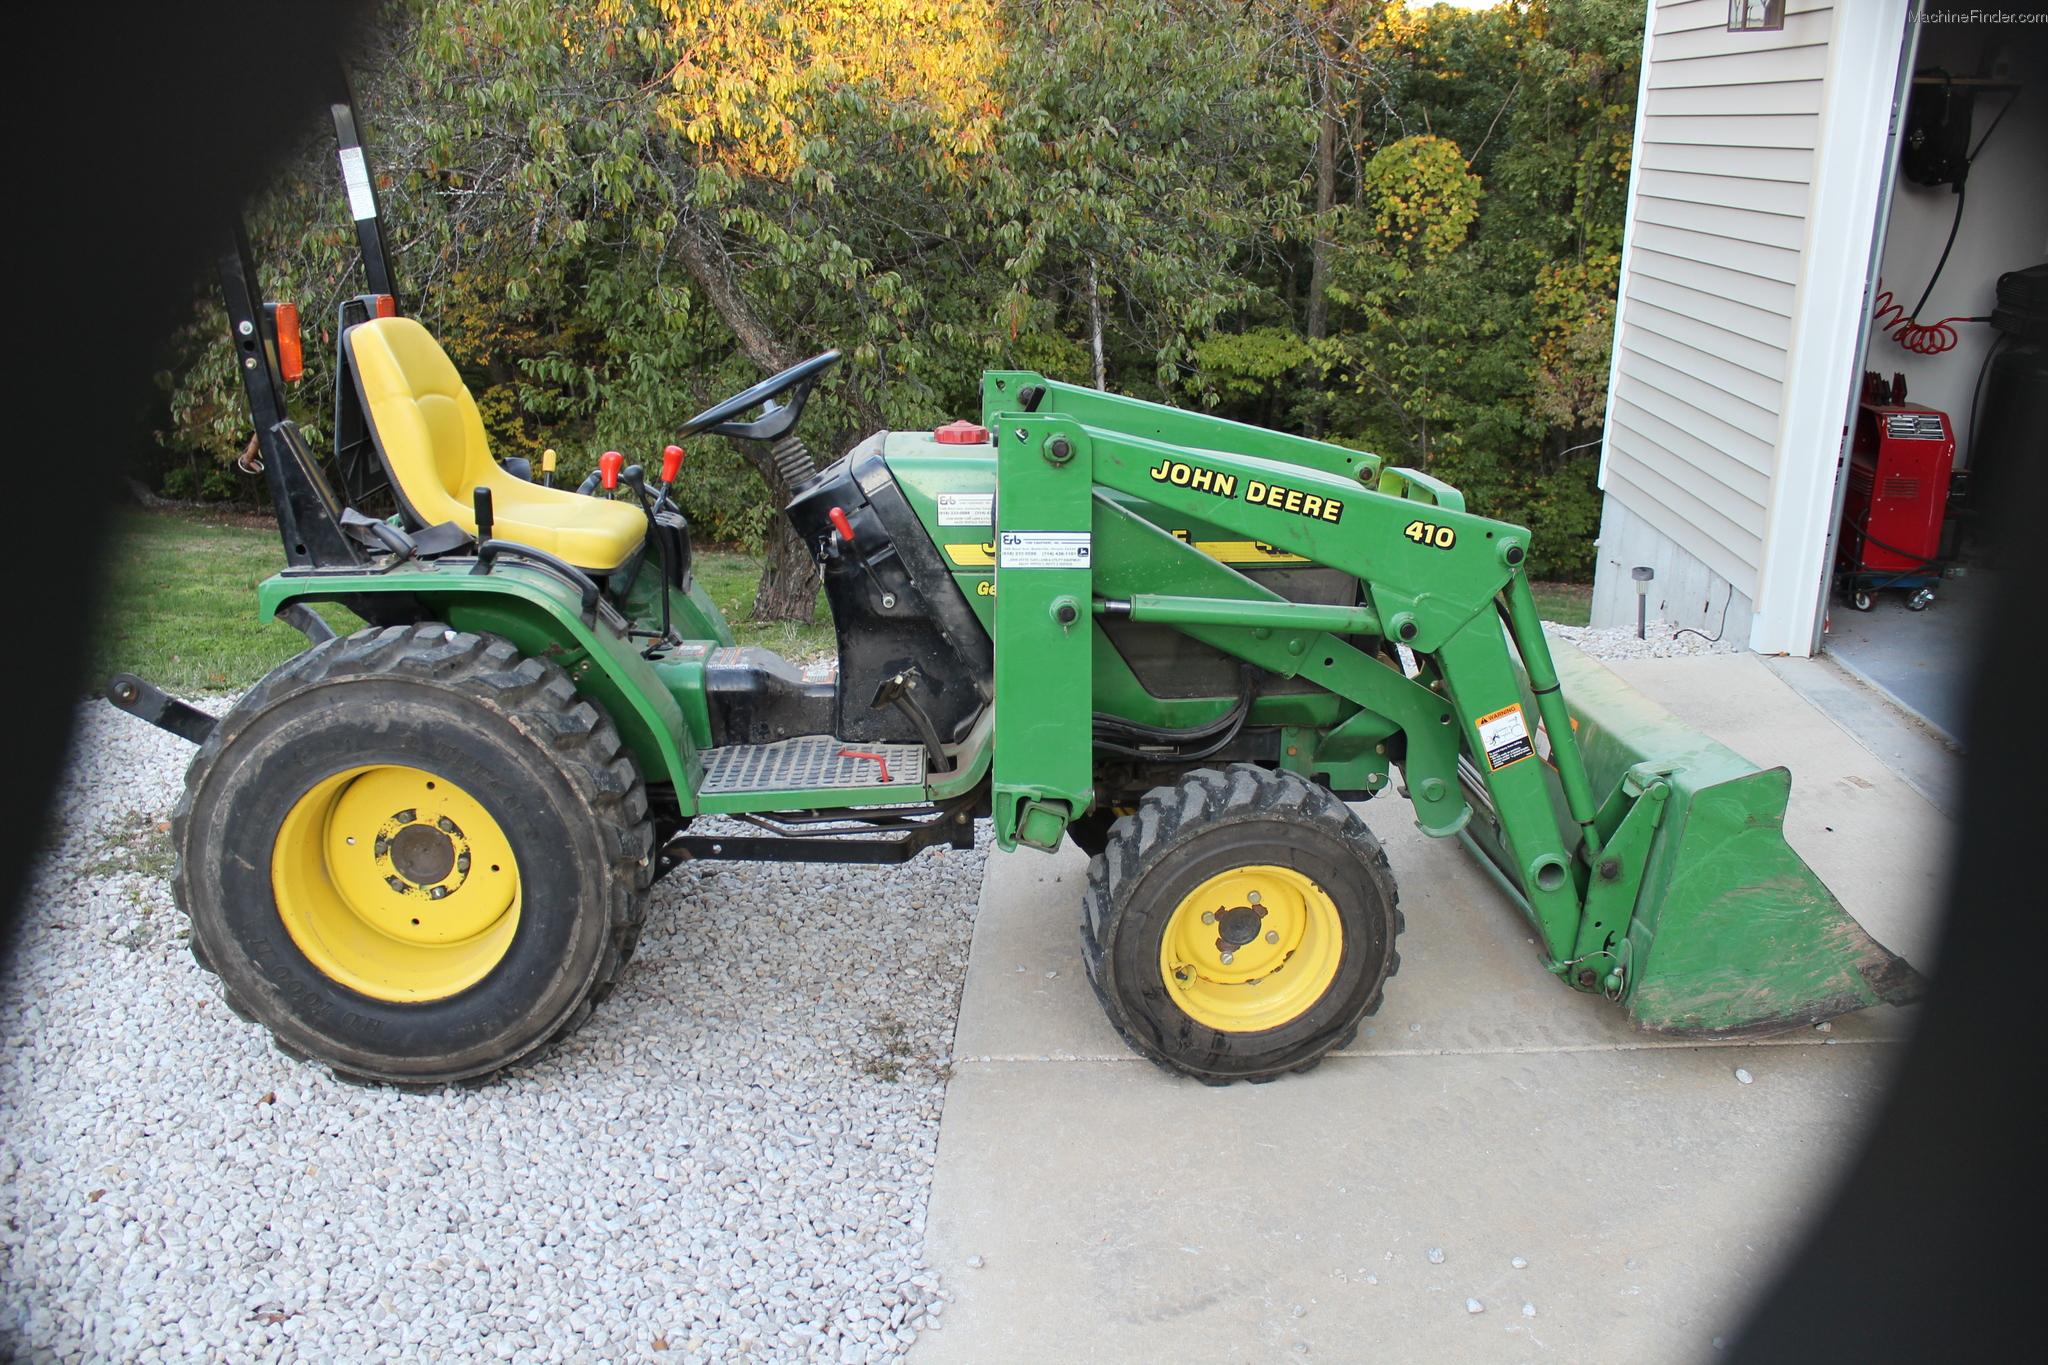 2001 John Deere 4100 Tractors - Compact (1-40hp.) - John ...